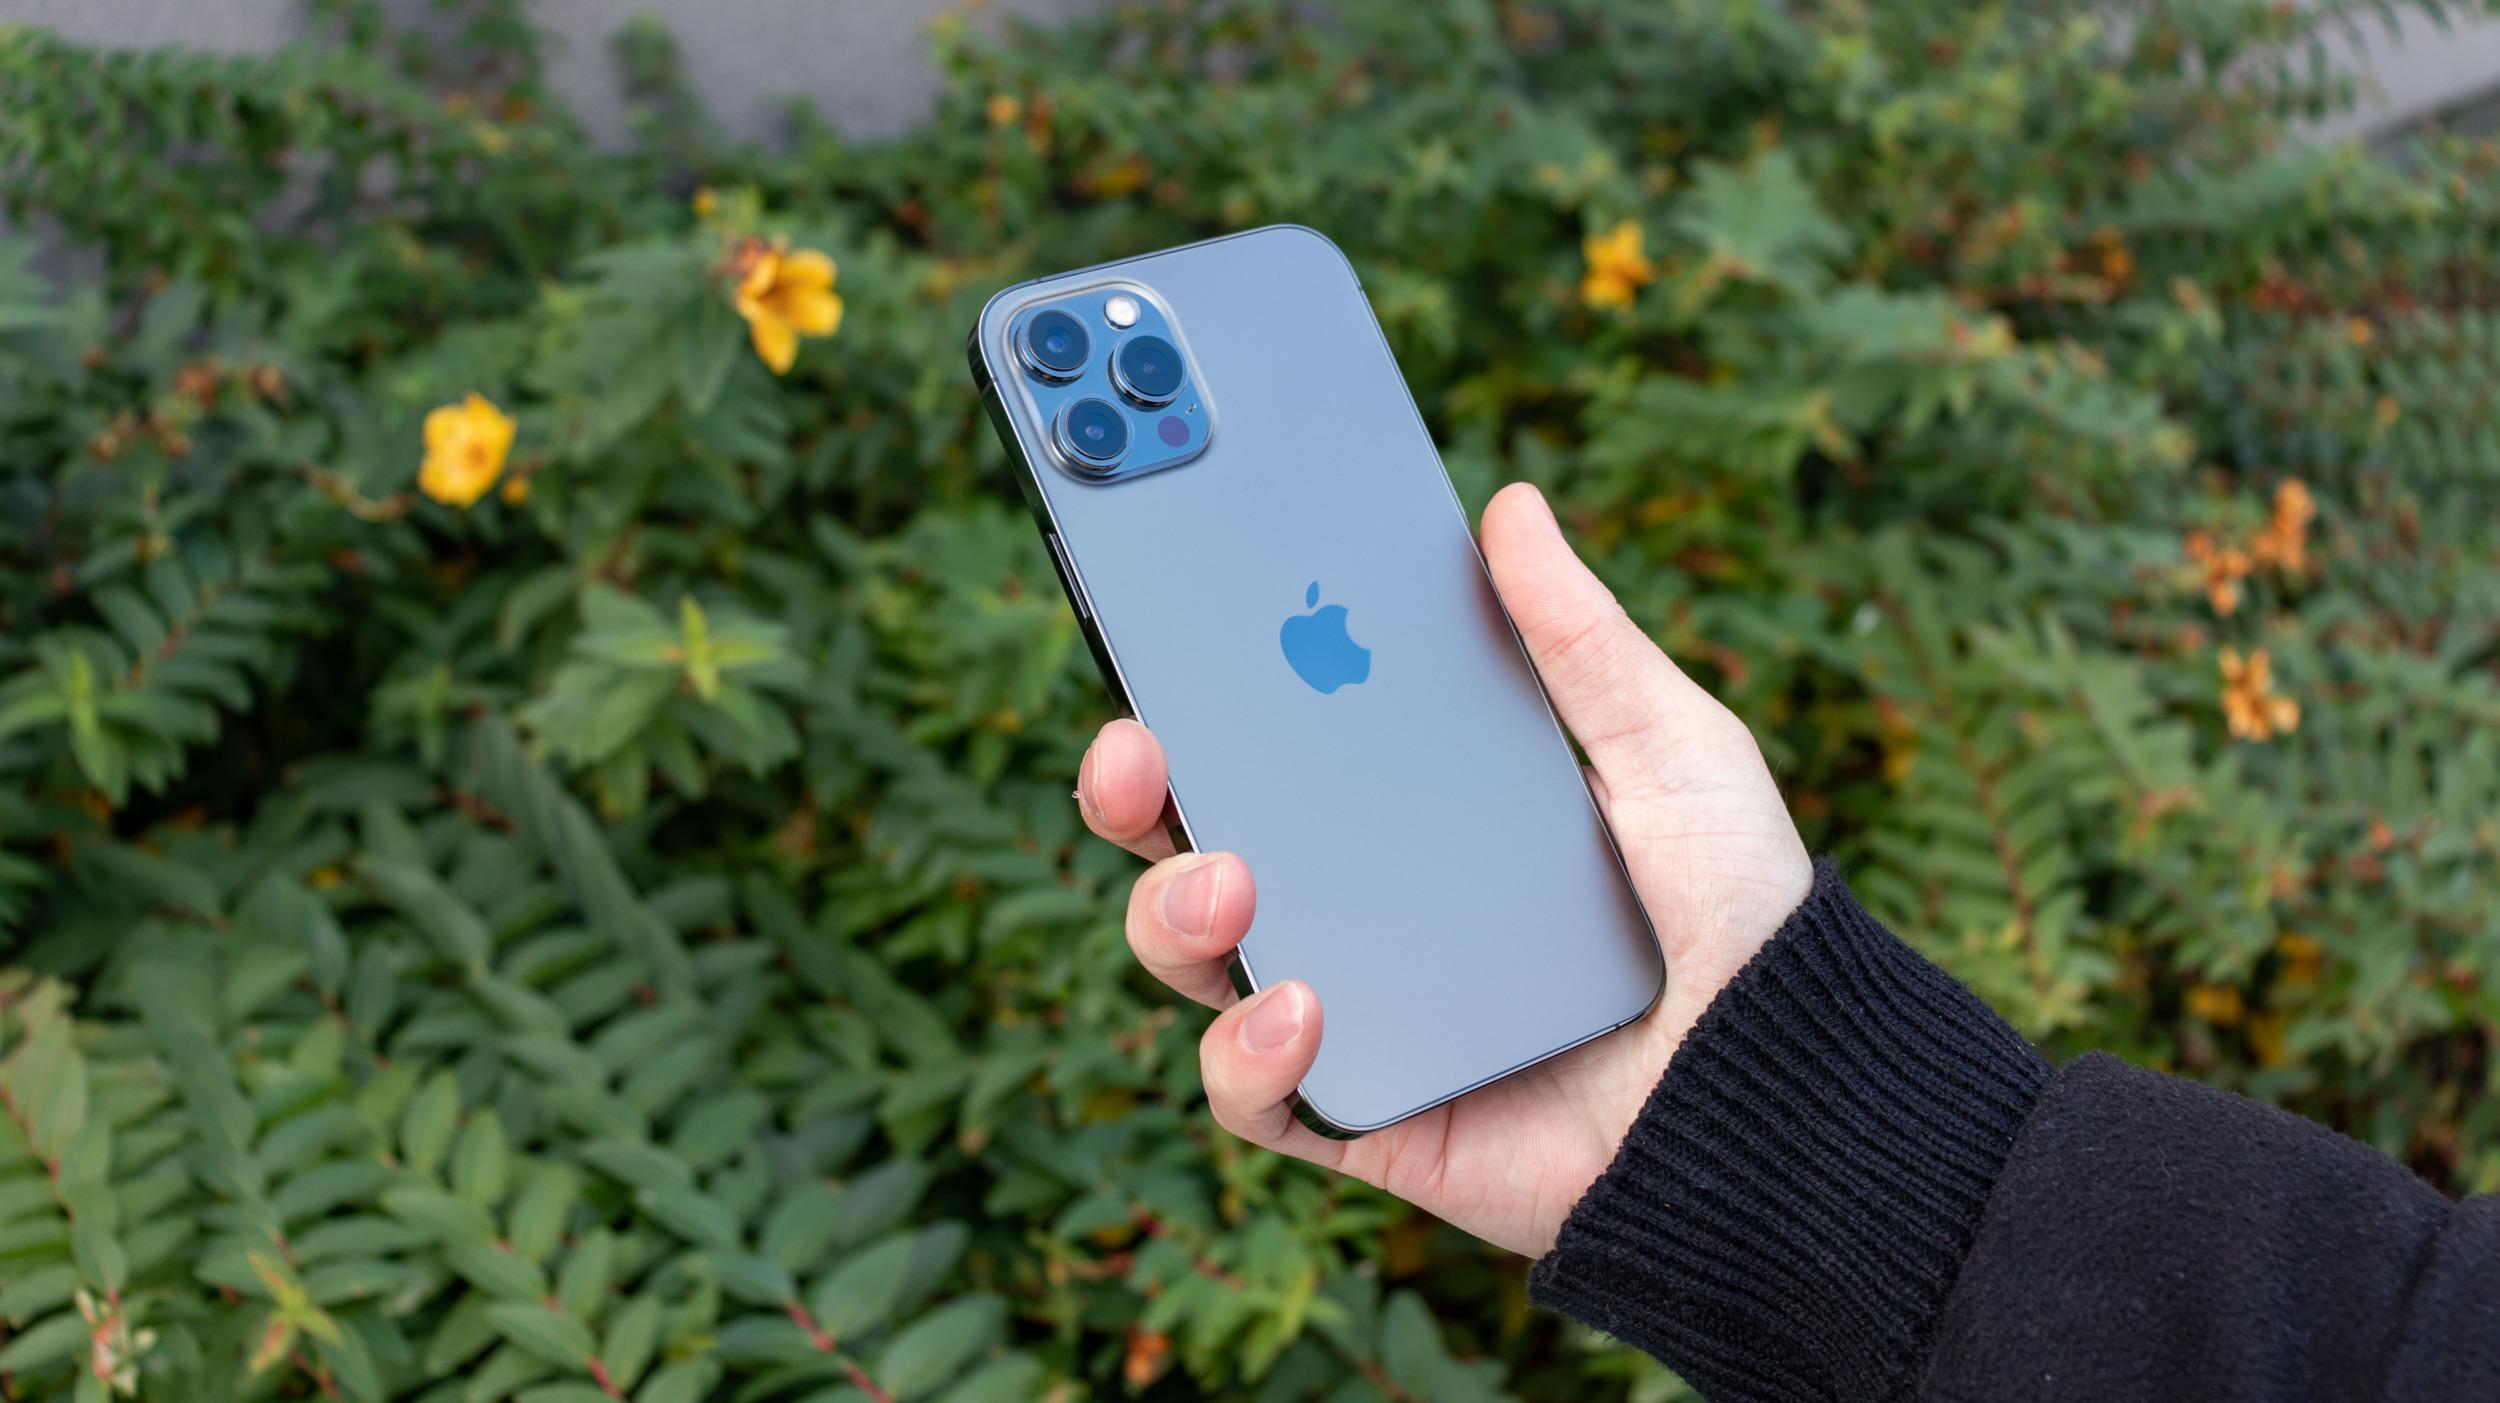 Apple potvrdil vývoj vlastního 5G modemu, aby nahradil ten od Qualcommu